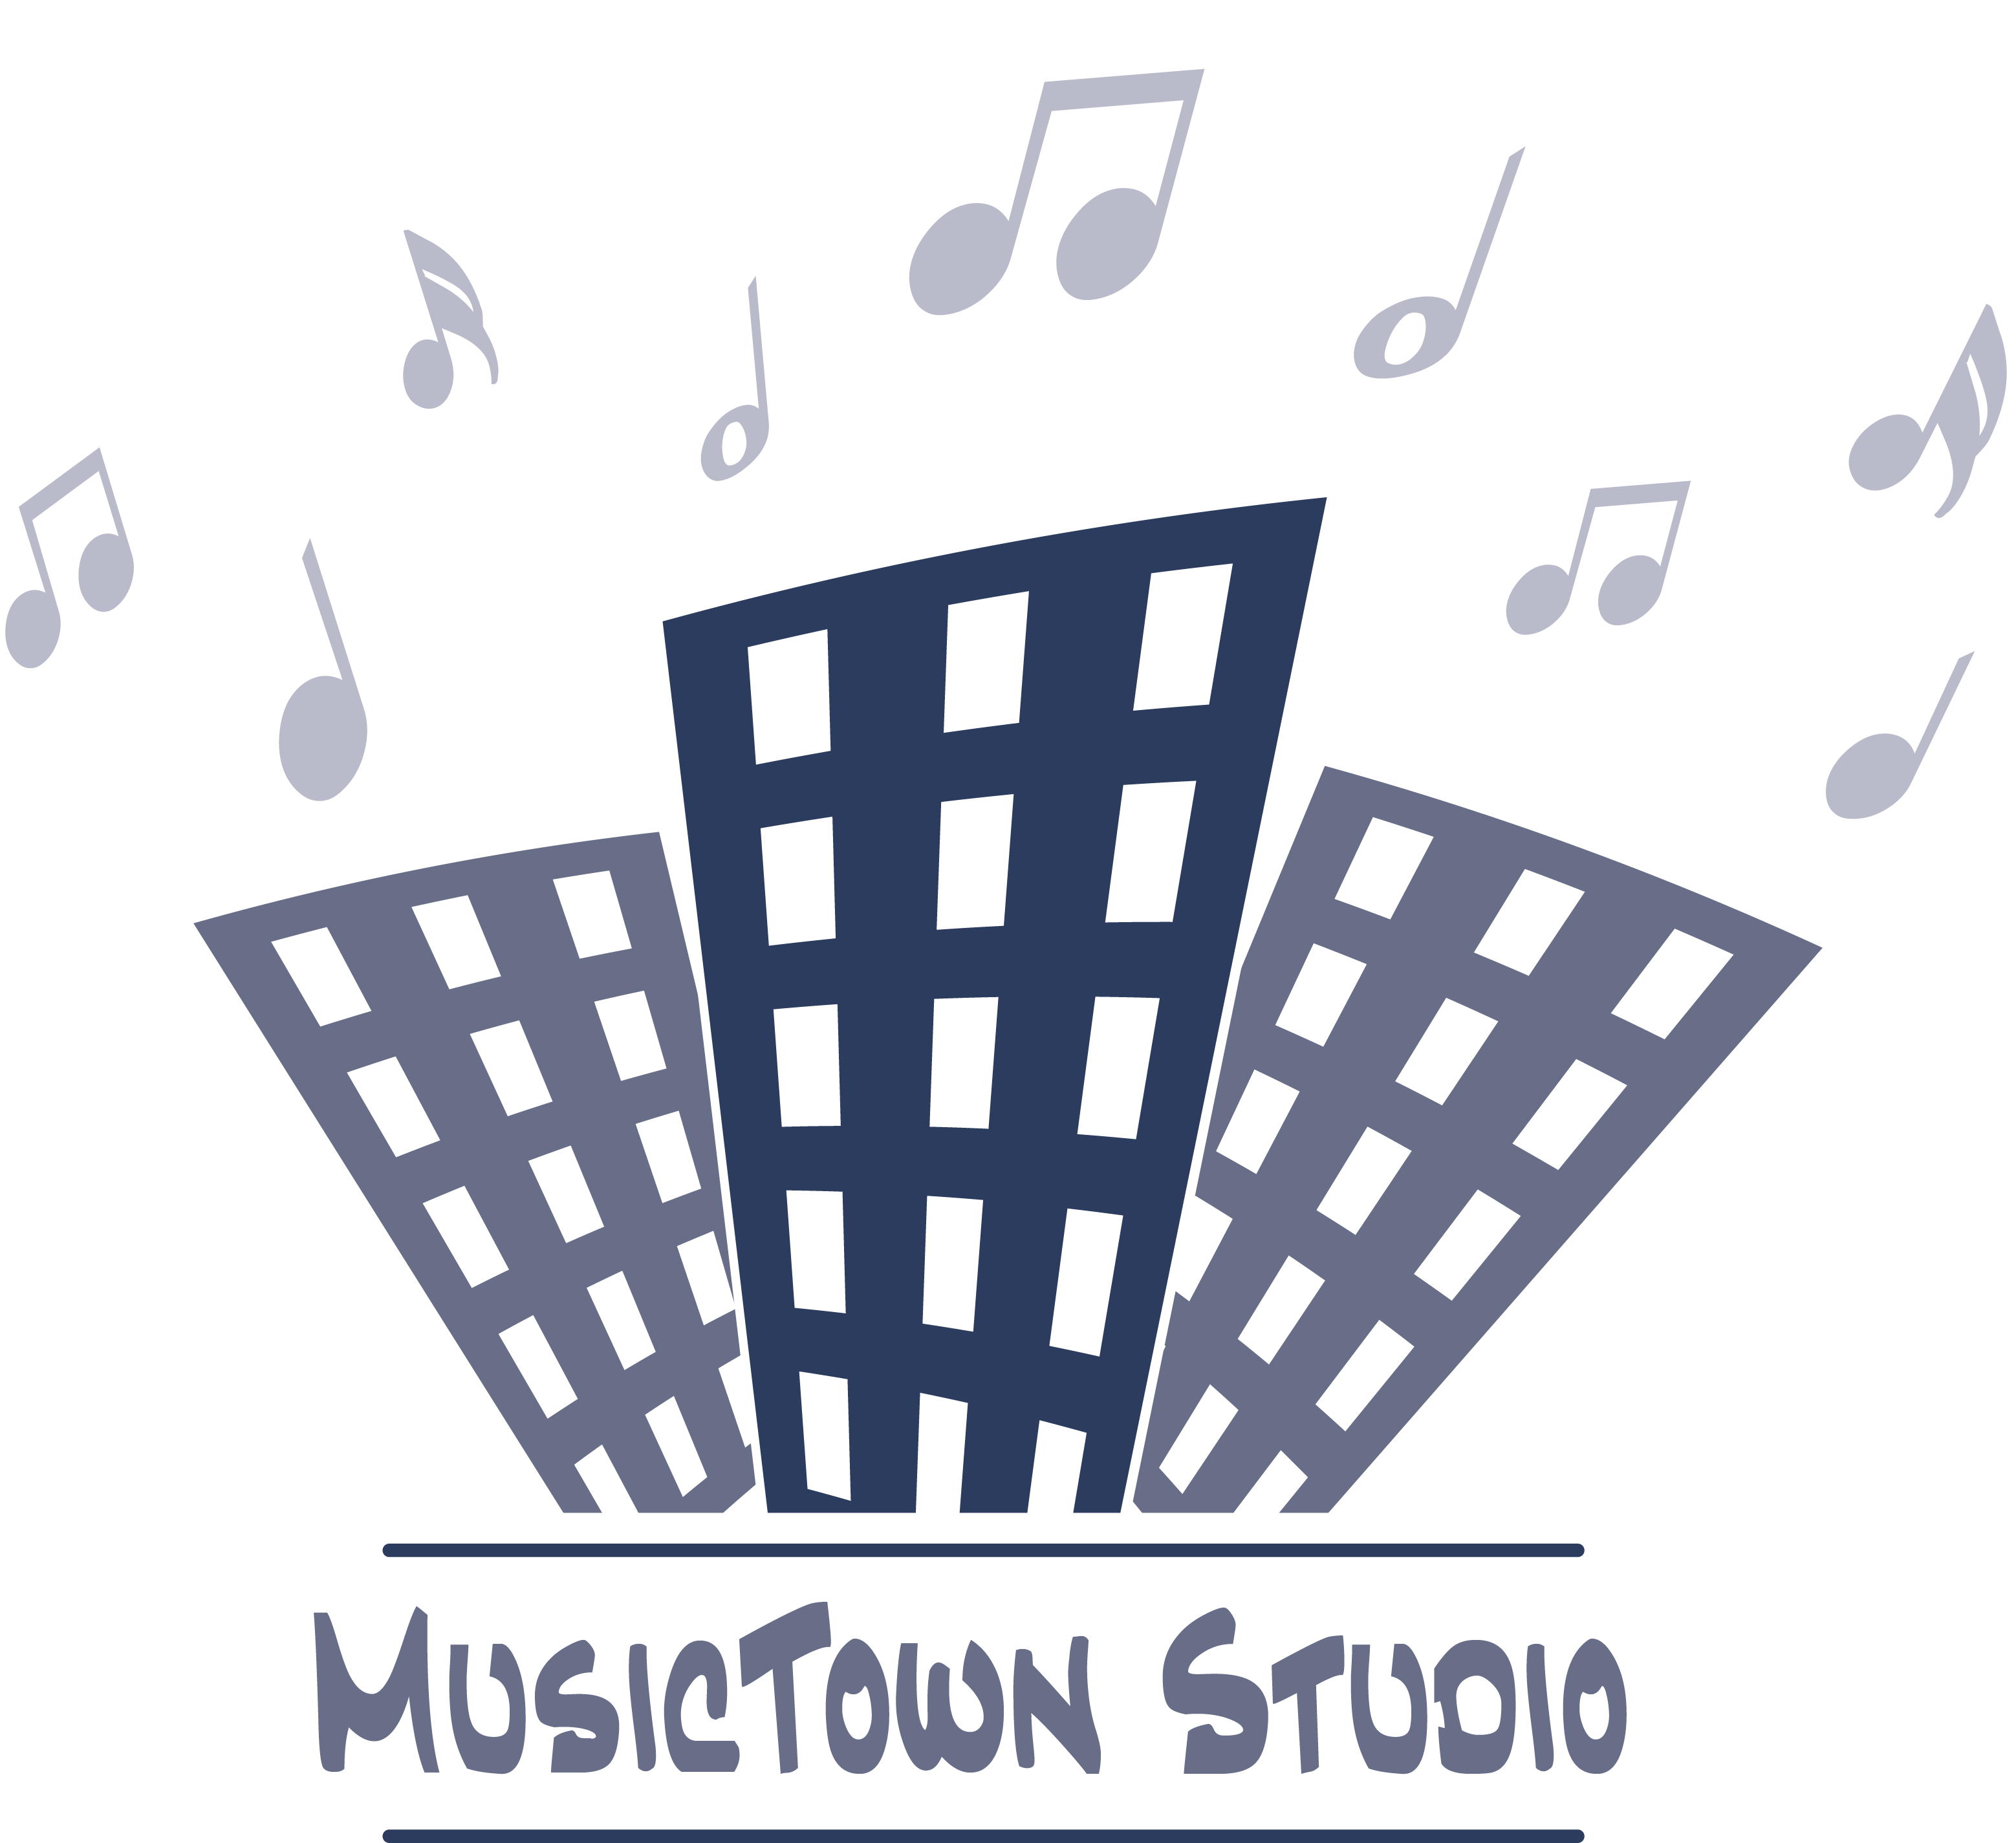 Musictown Studio